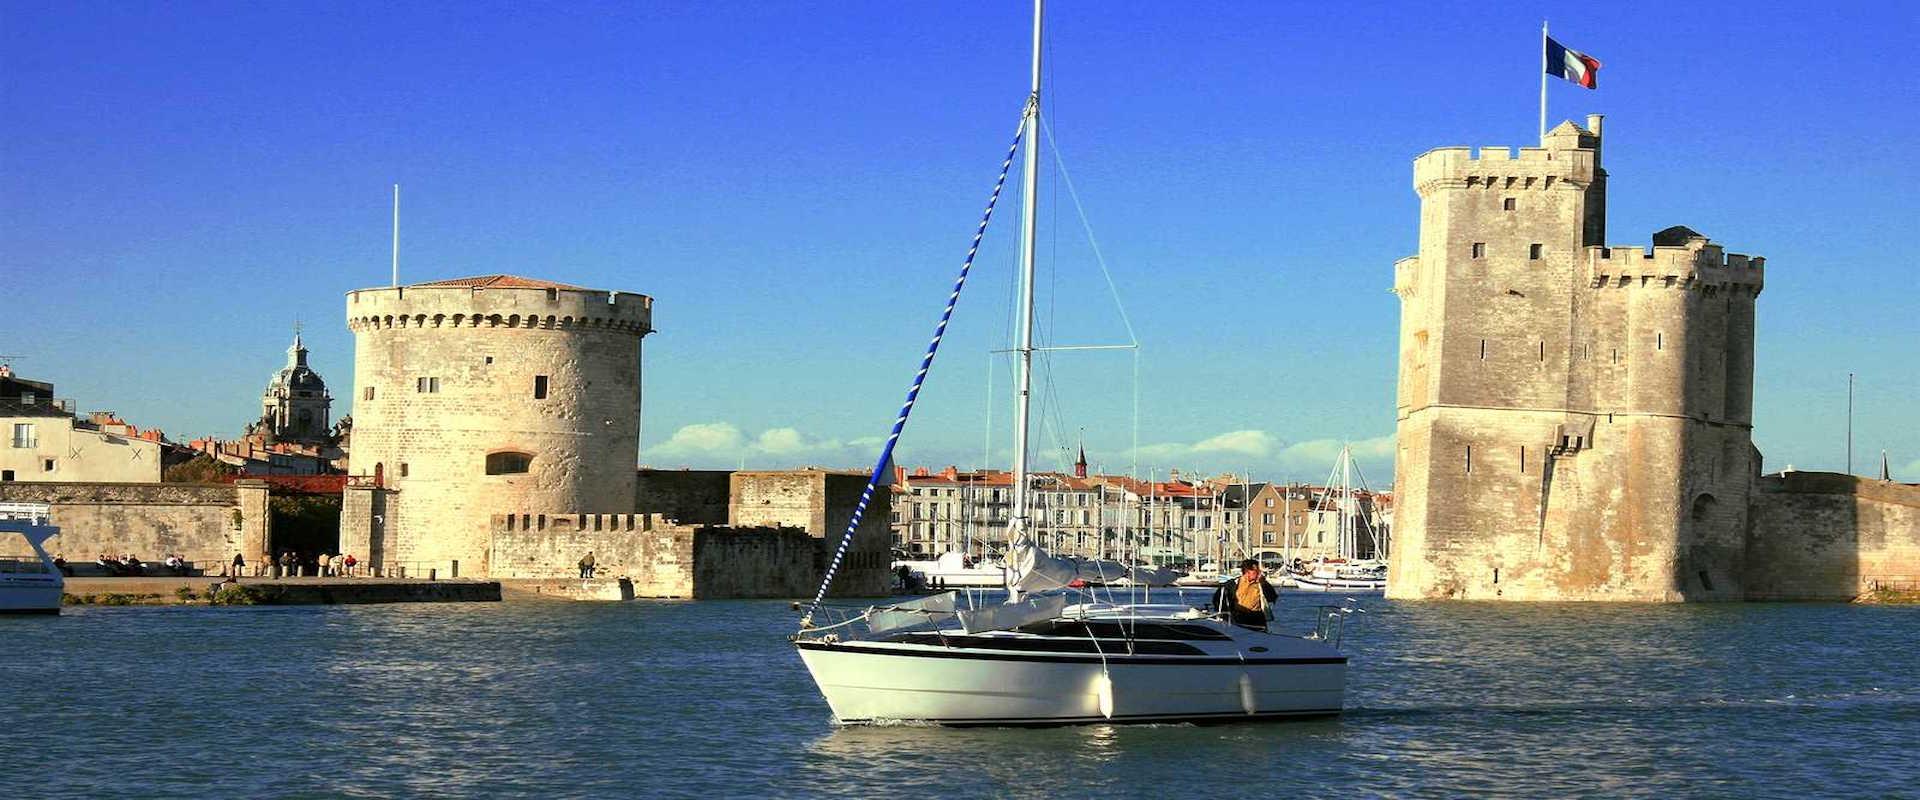 agence assurance de La Rochelle